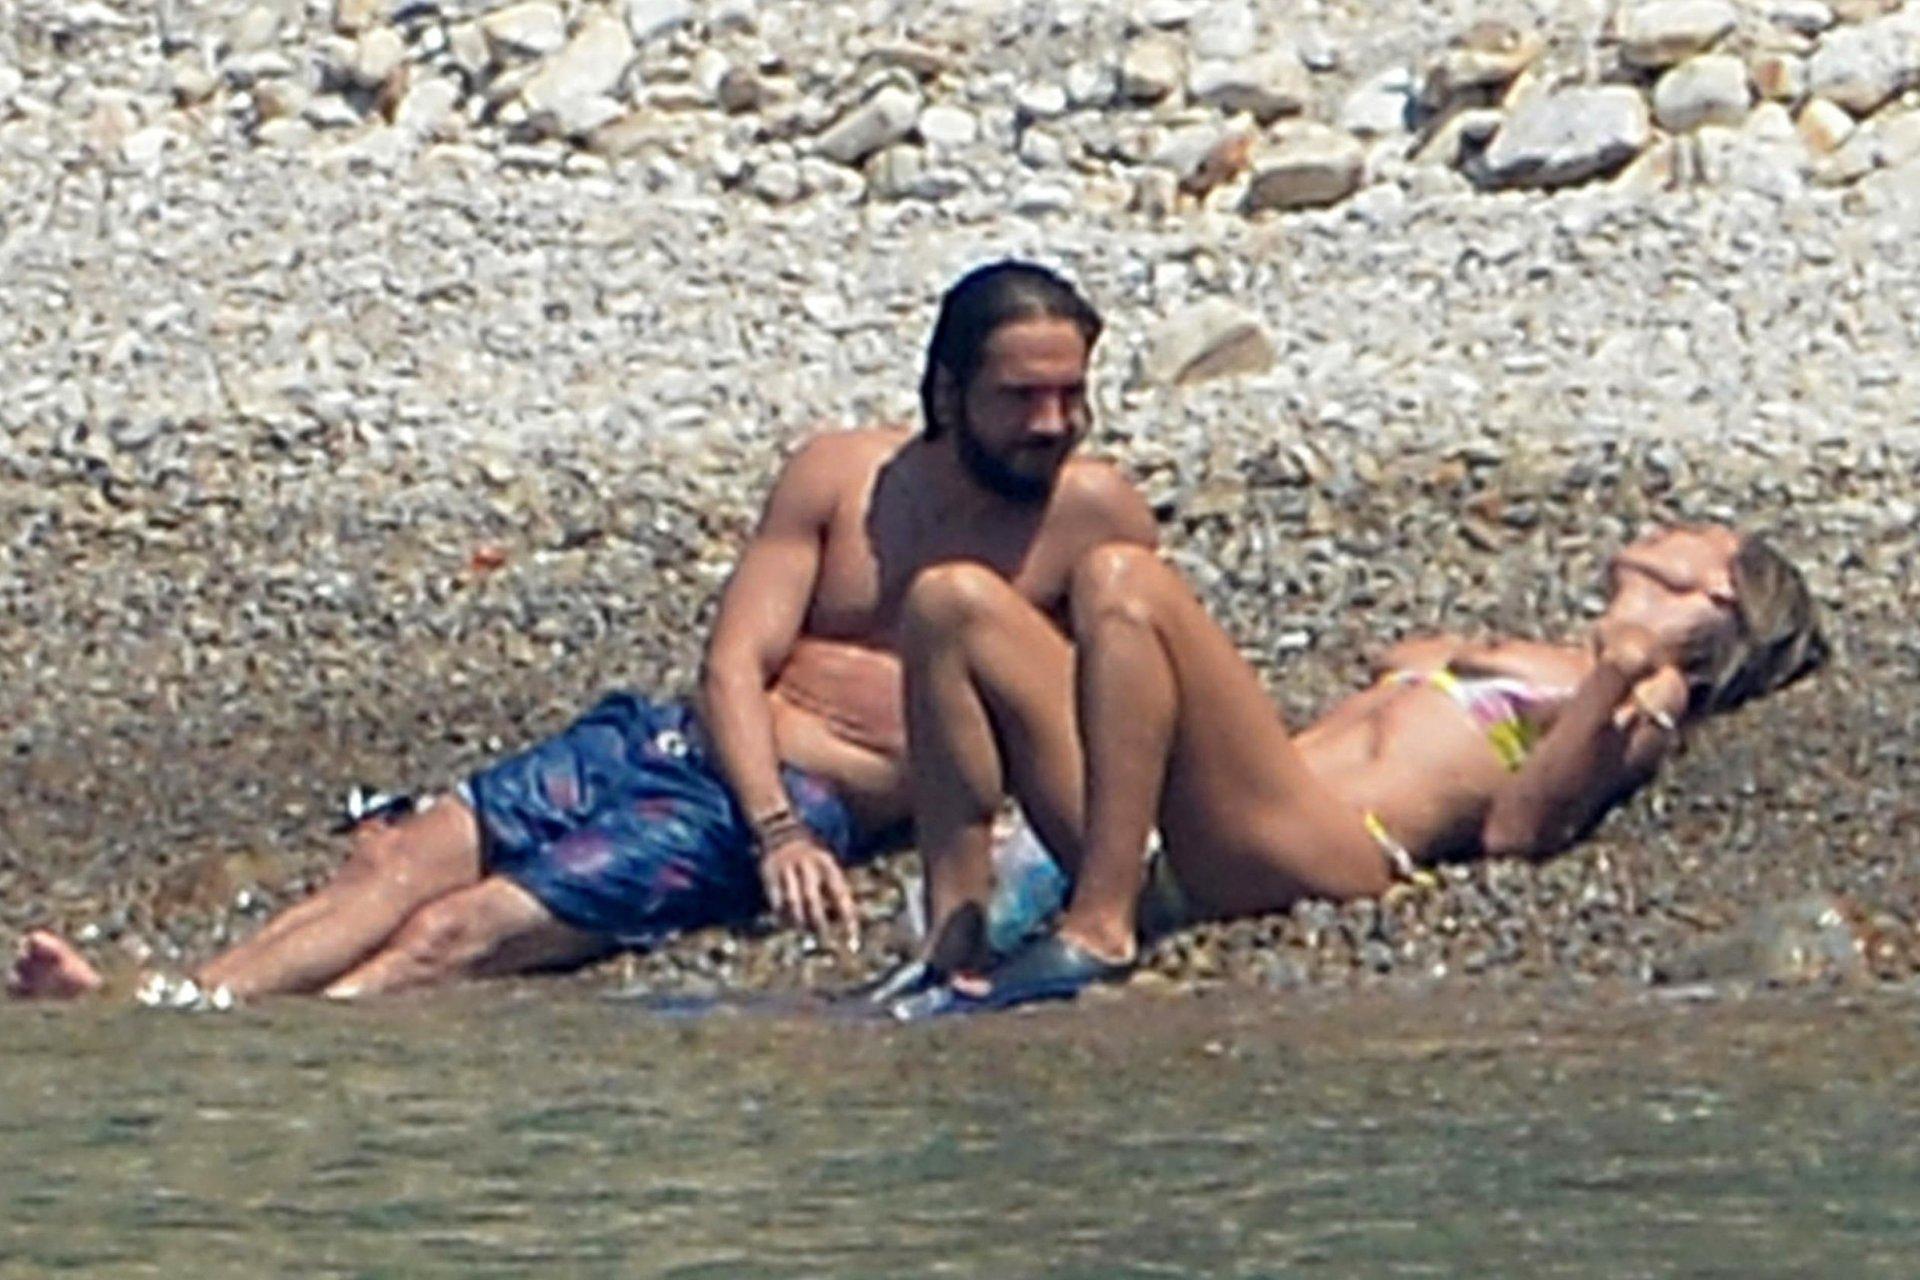 Heidi-Klum-Sexy-Topless-65-thefappeningblog.com_.jpg